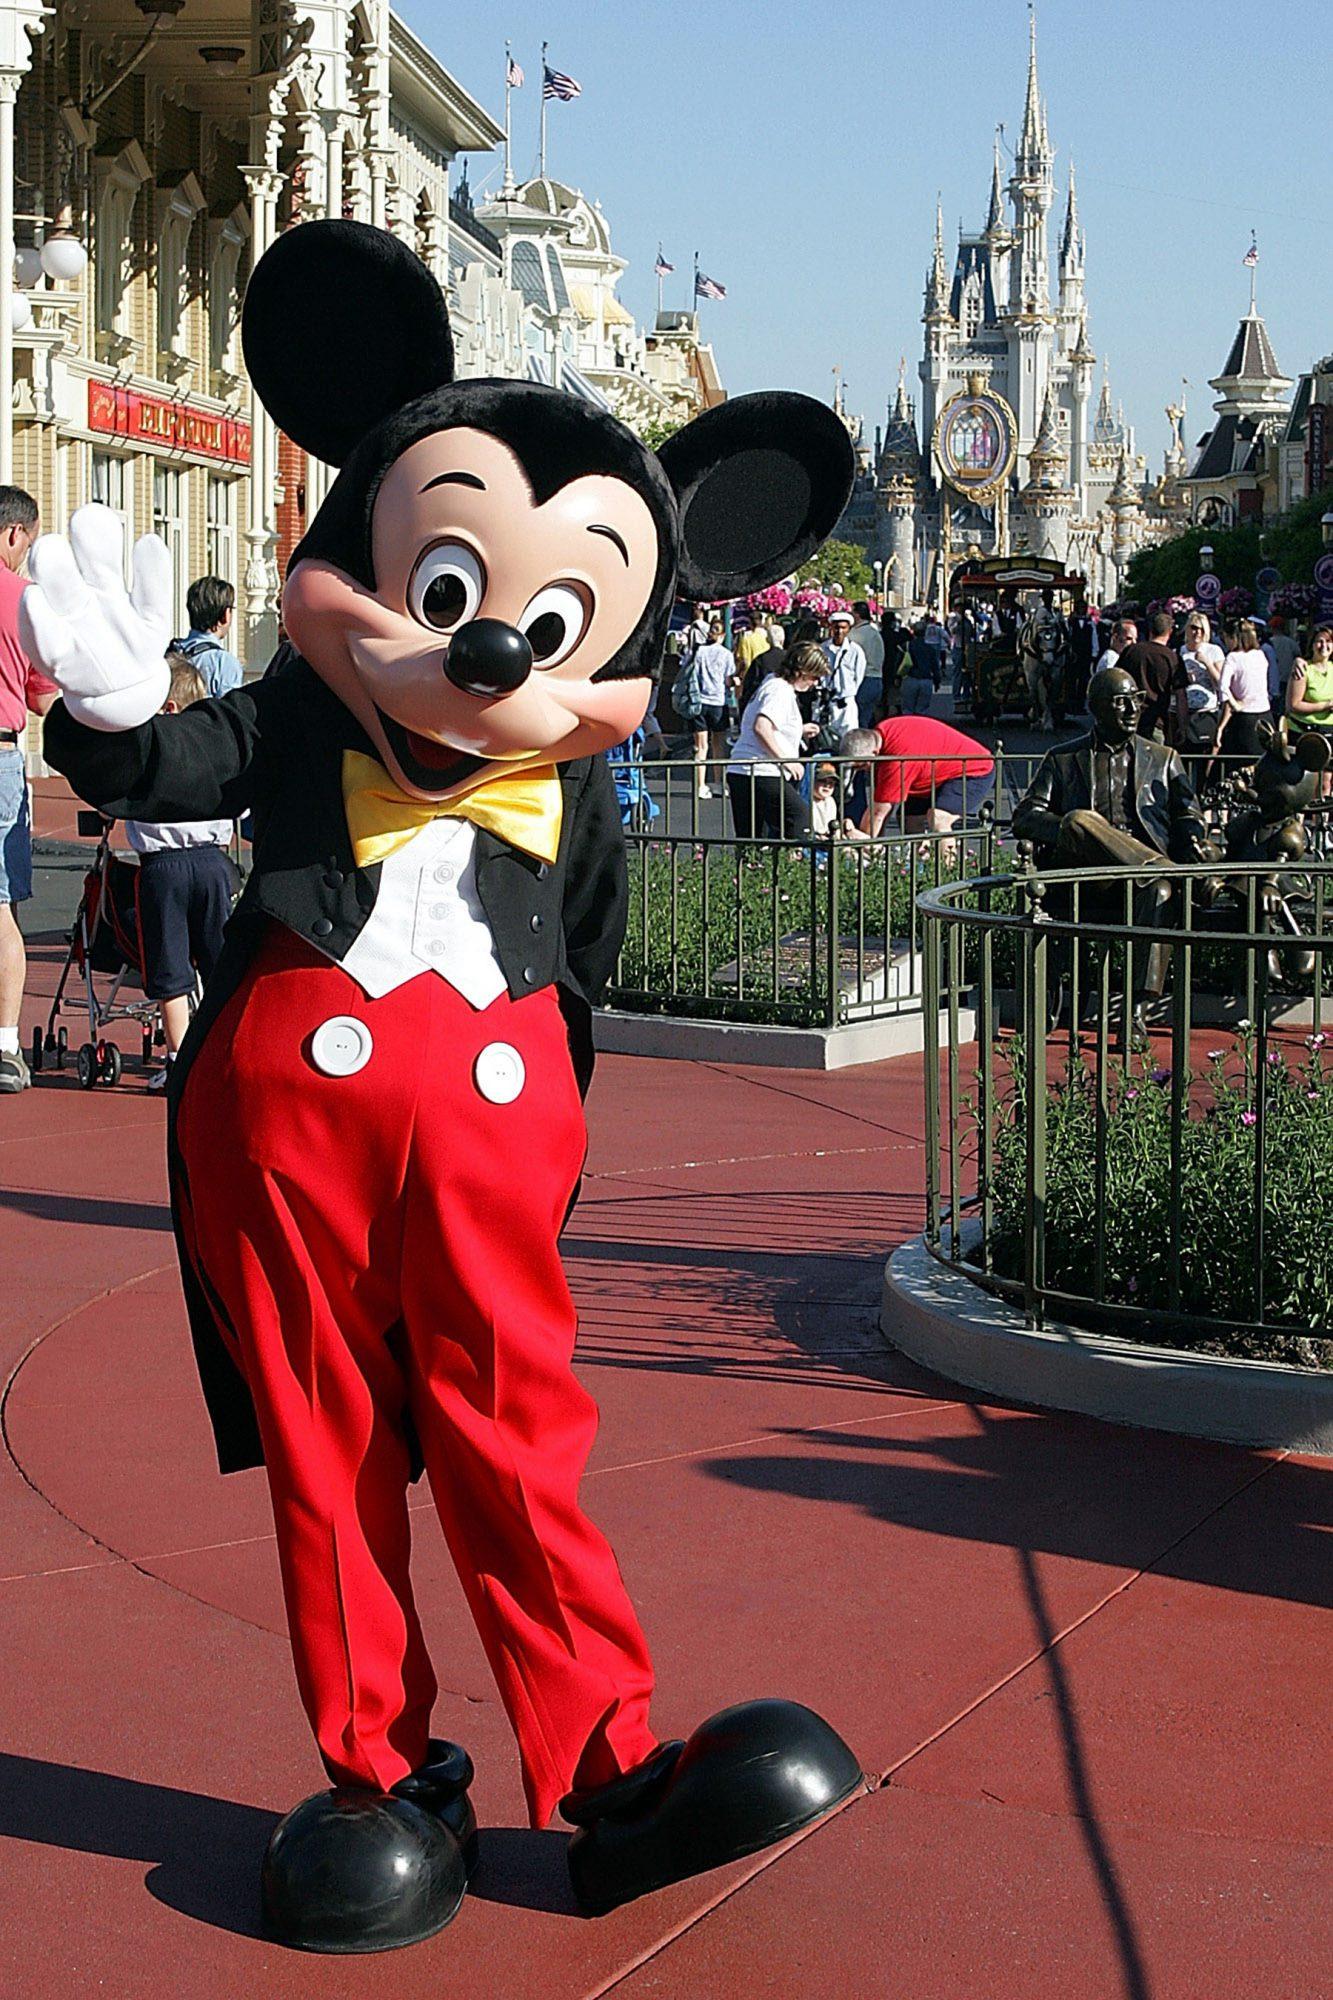 Mickey Mouse greets patrons entering Disney's Magic Kingdom